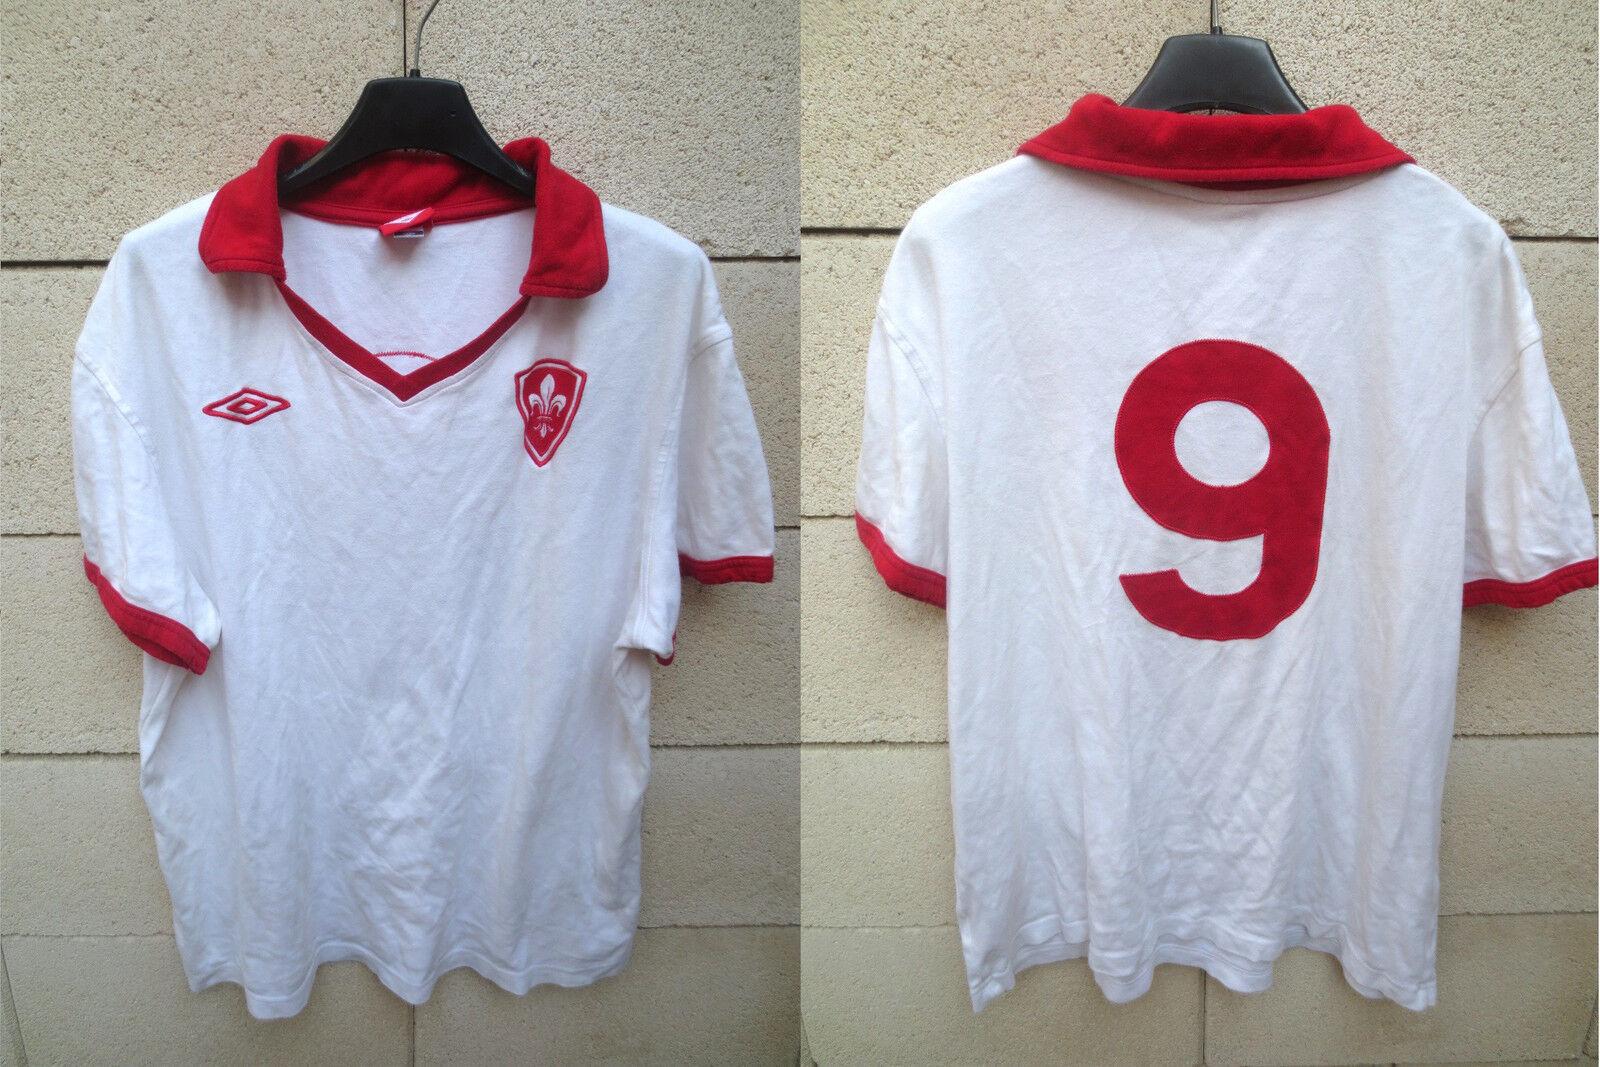 Maillot LILLE LOSC n°9 UMBRO rétro vintage coton shirt football oldschool XL